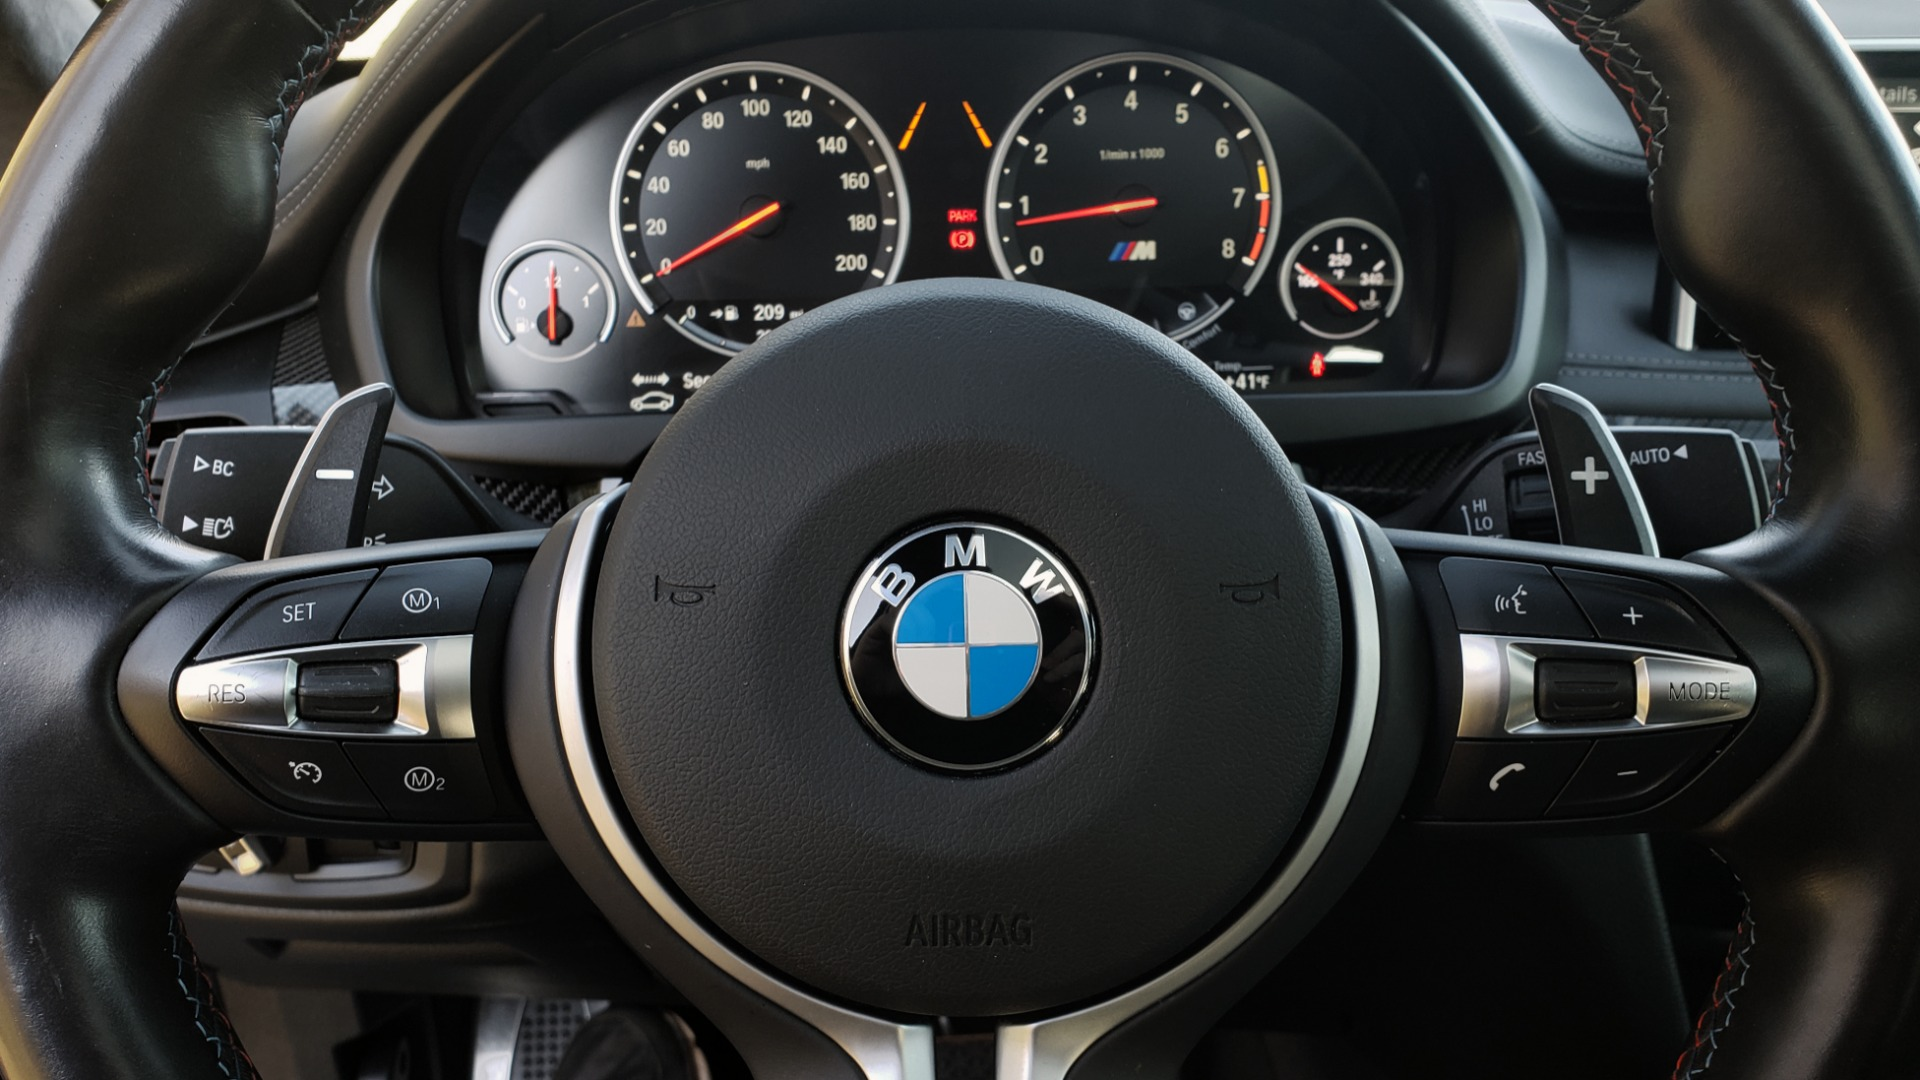 Used 2016 BMW X6 M EXEC PKG / DRVR ASST / NAV / SUNROOF / BLIND SPOT / REARVIEW for sale Sold at Formula Imports in Charlotte NC 28227 41